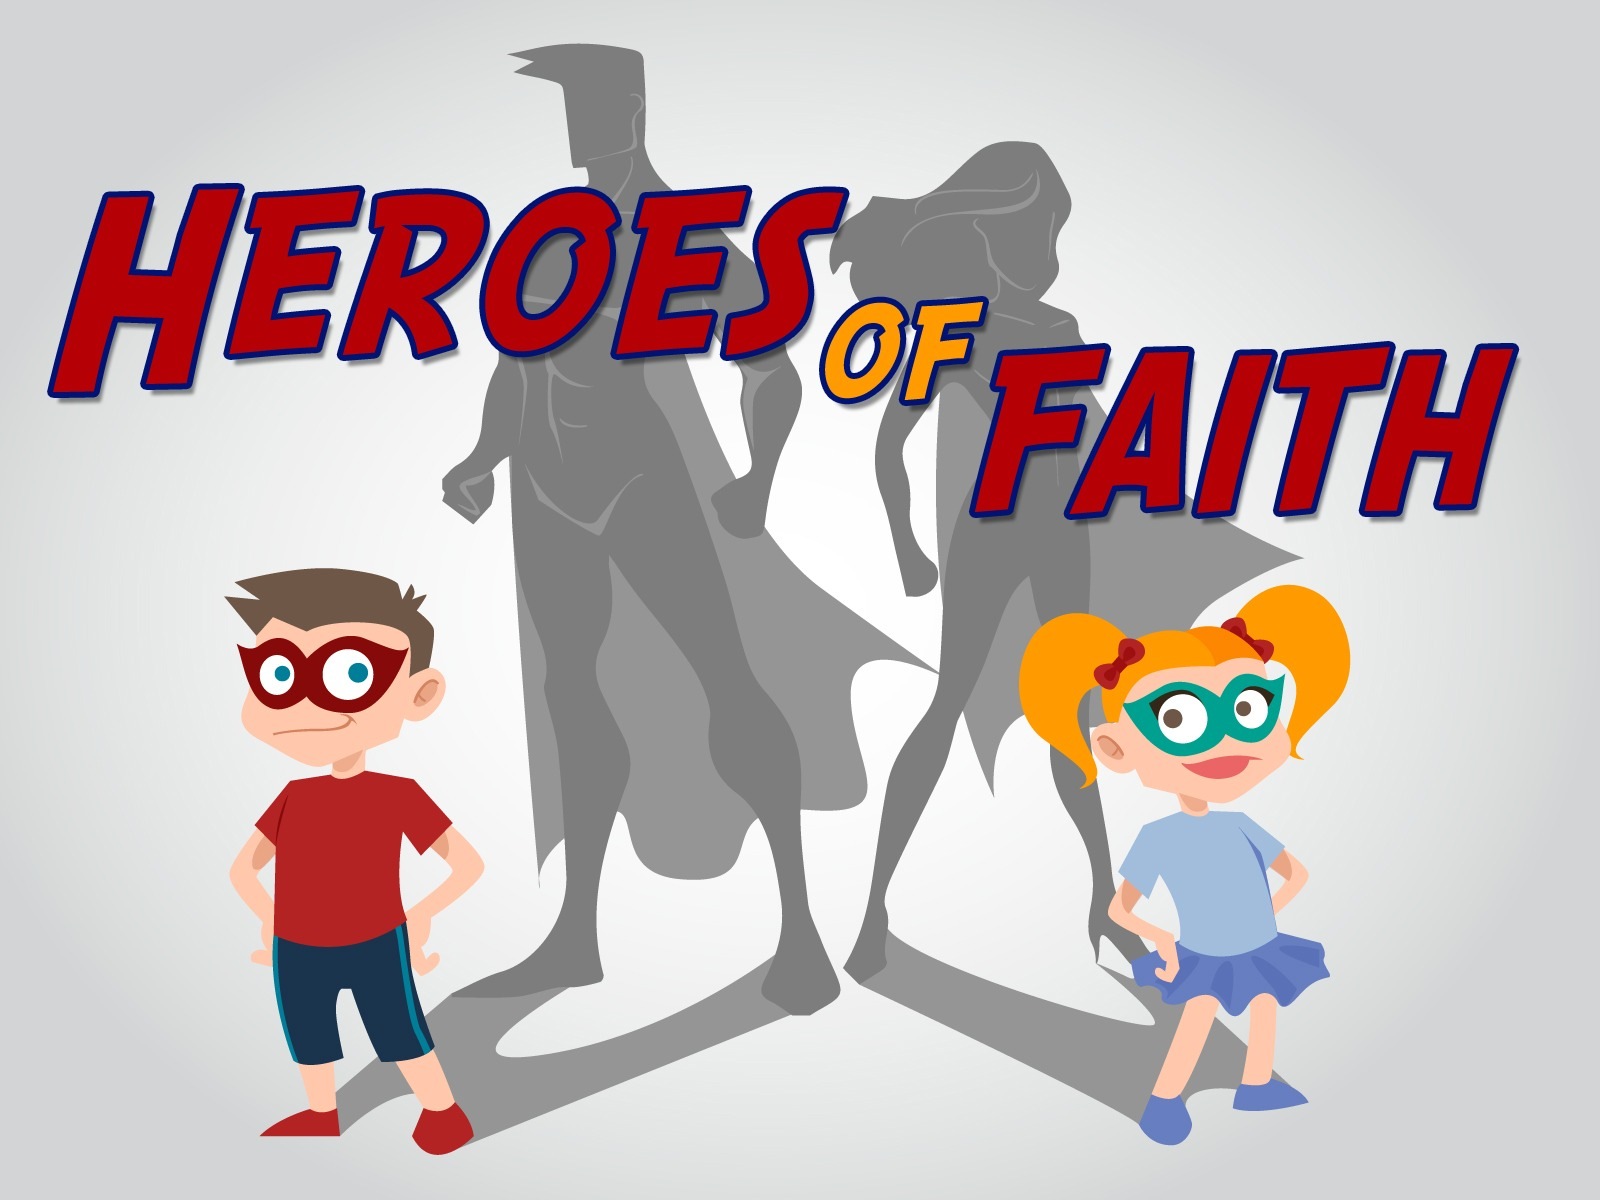 Good Super Church Curriculum #6: Heroes-of-faith-title-image.jpg